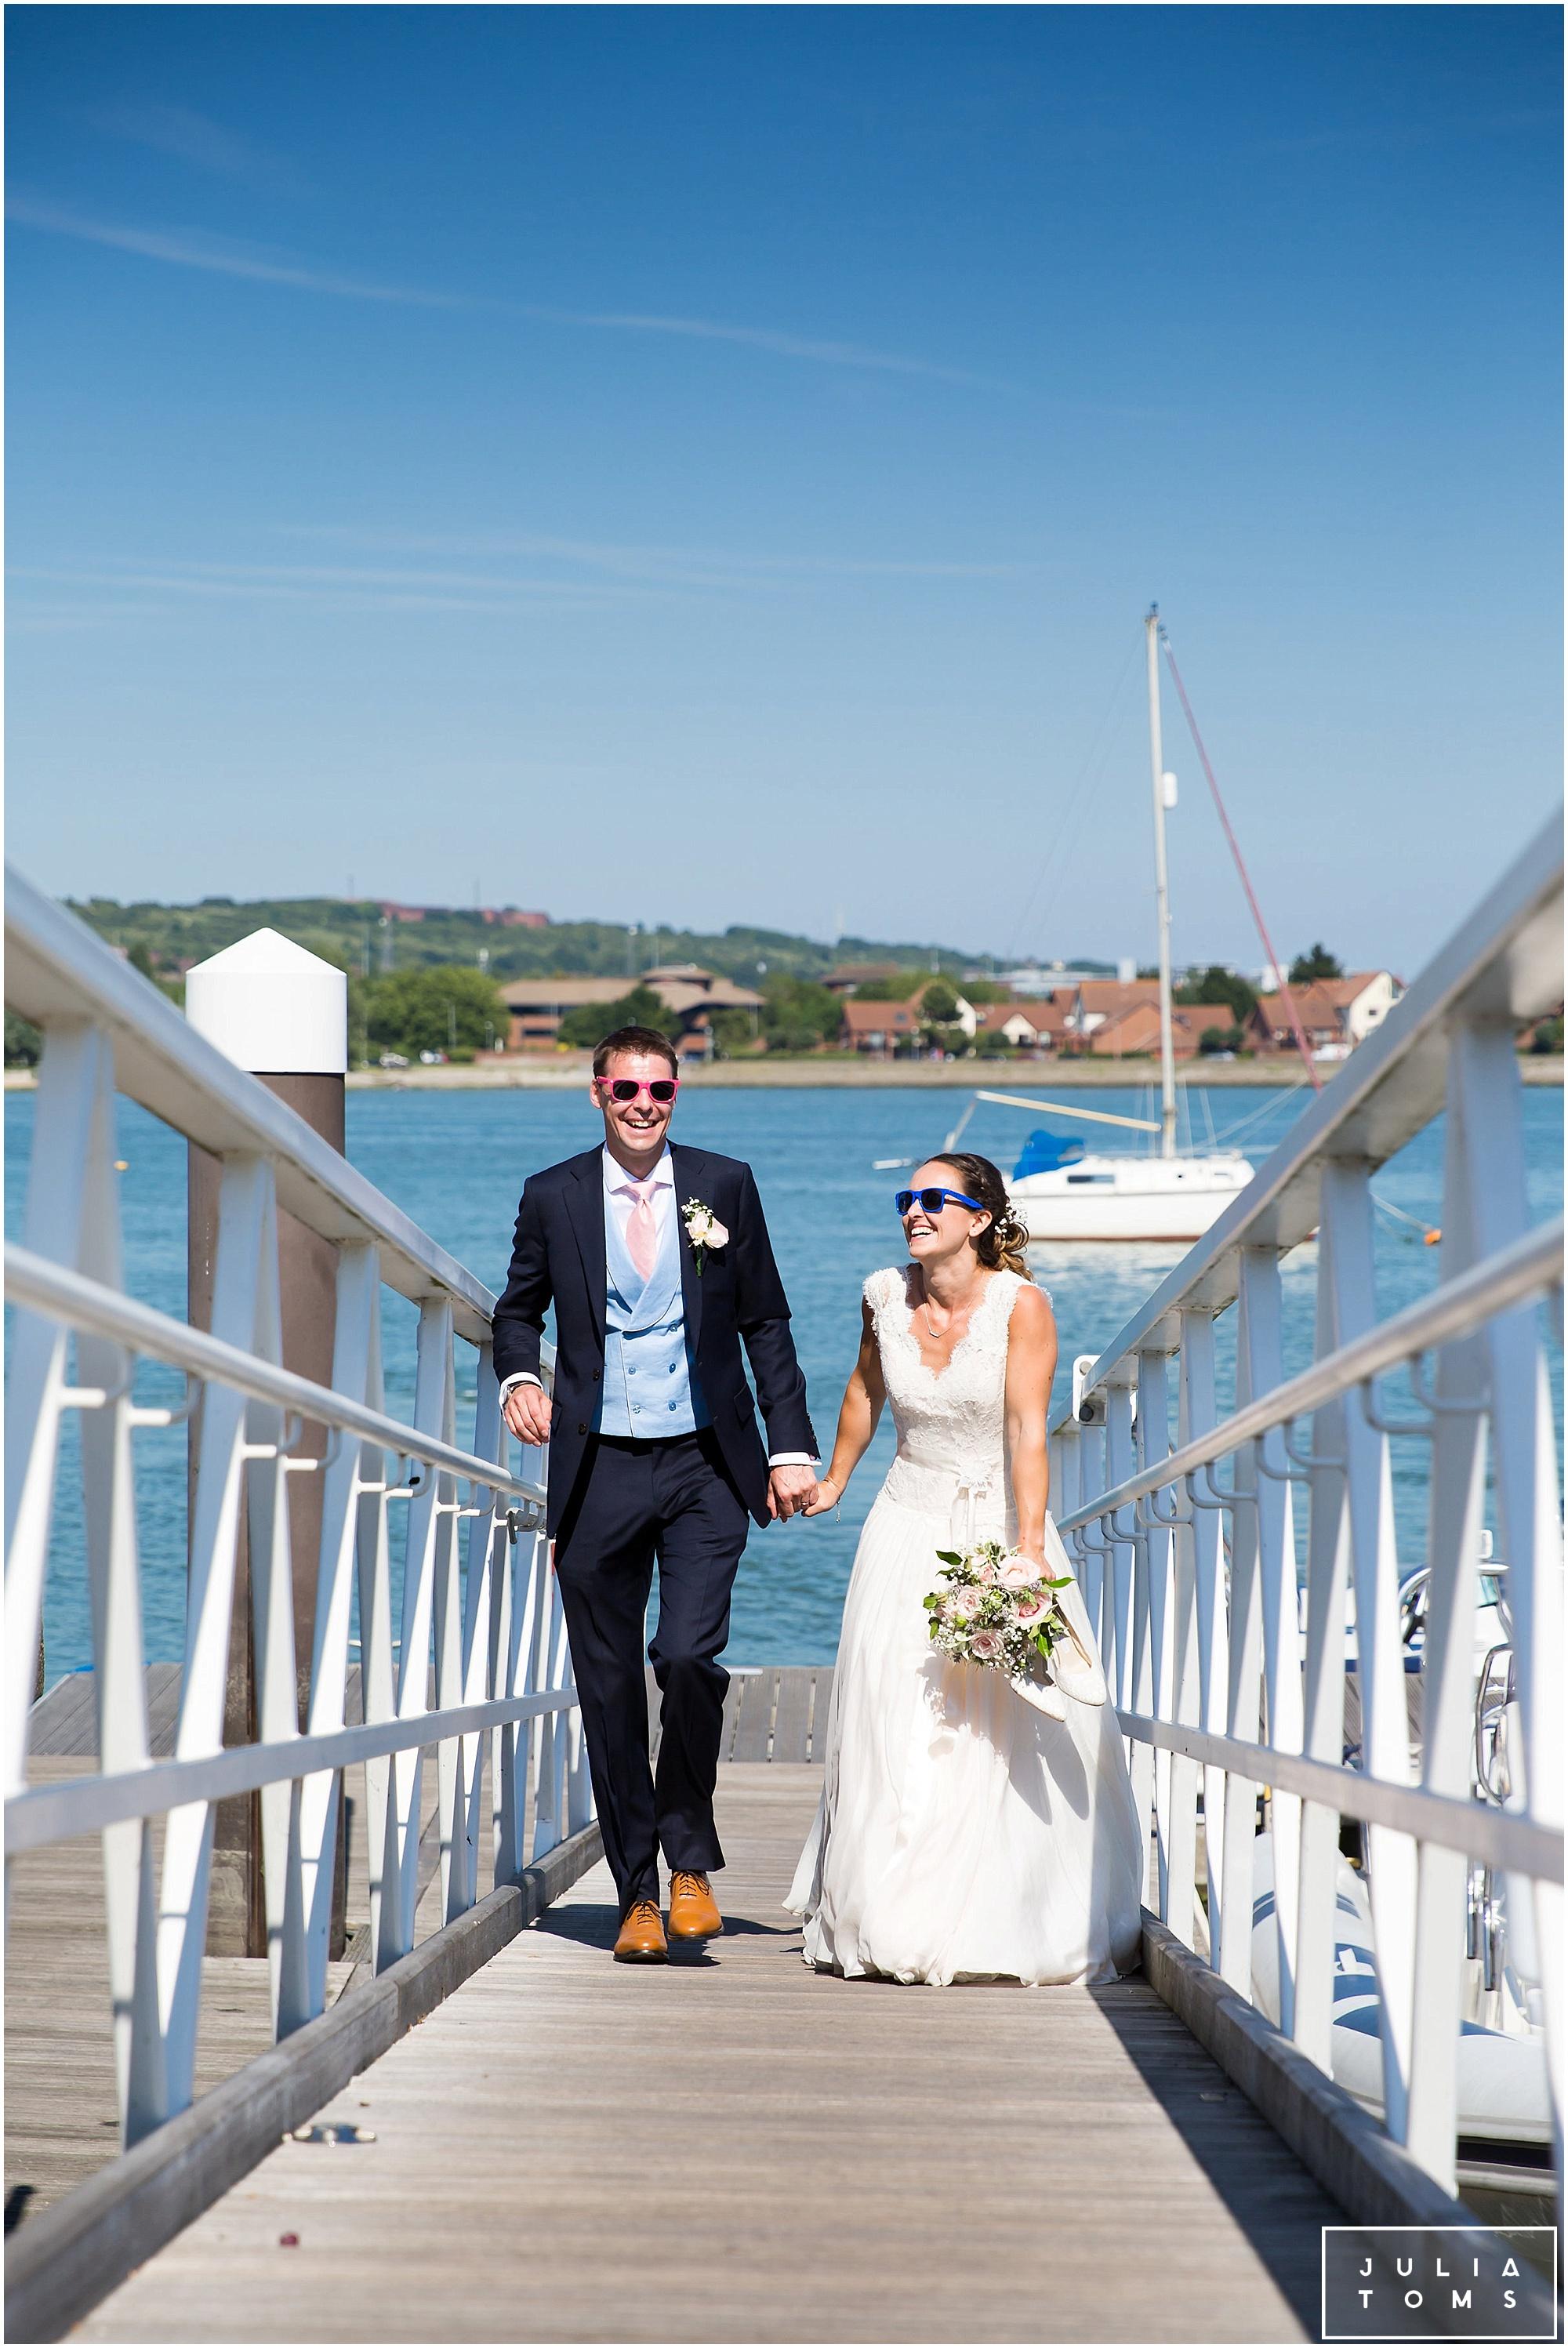 julia_toms_chichester_wedding_photographer_portsmouth_041.jpg